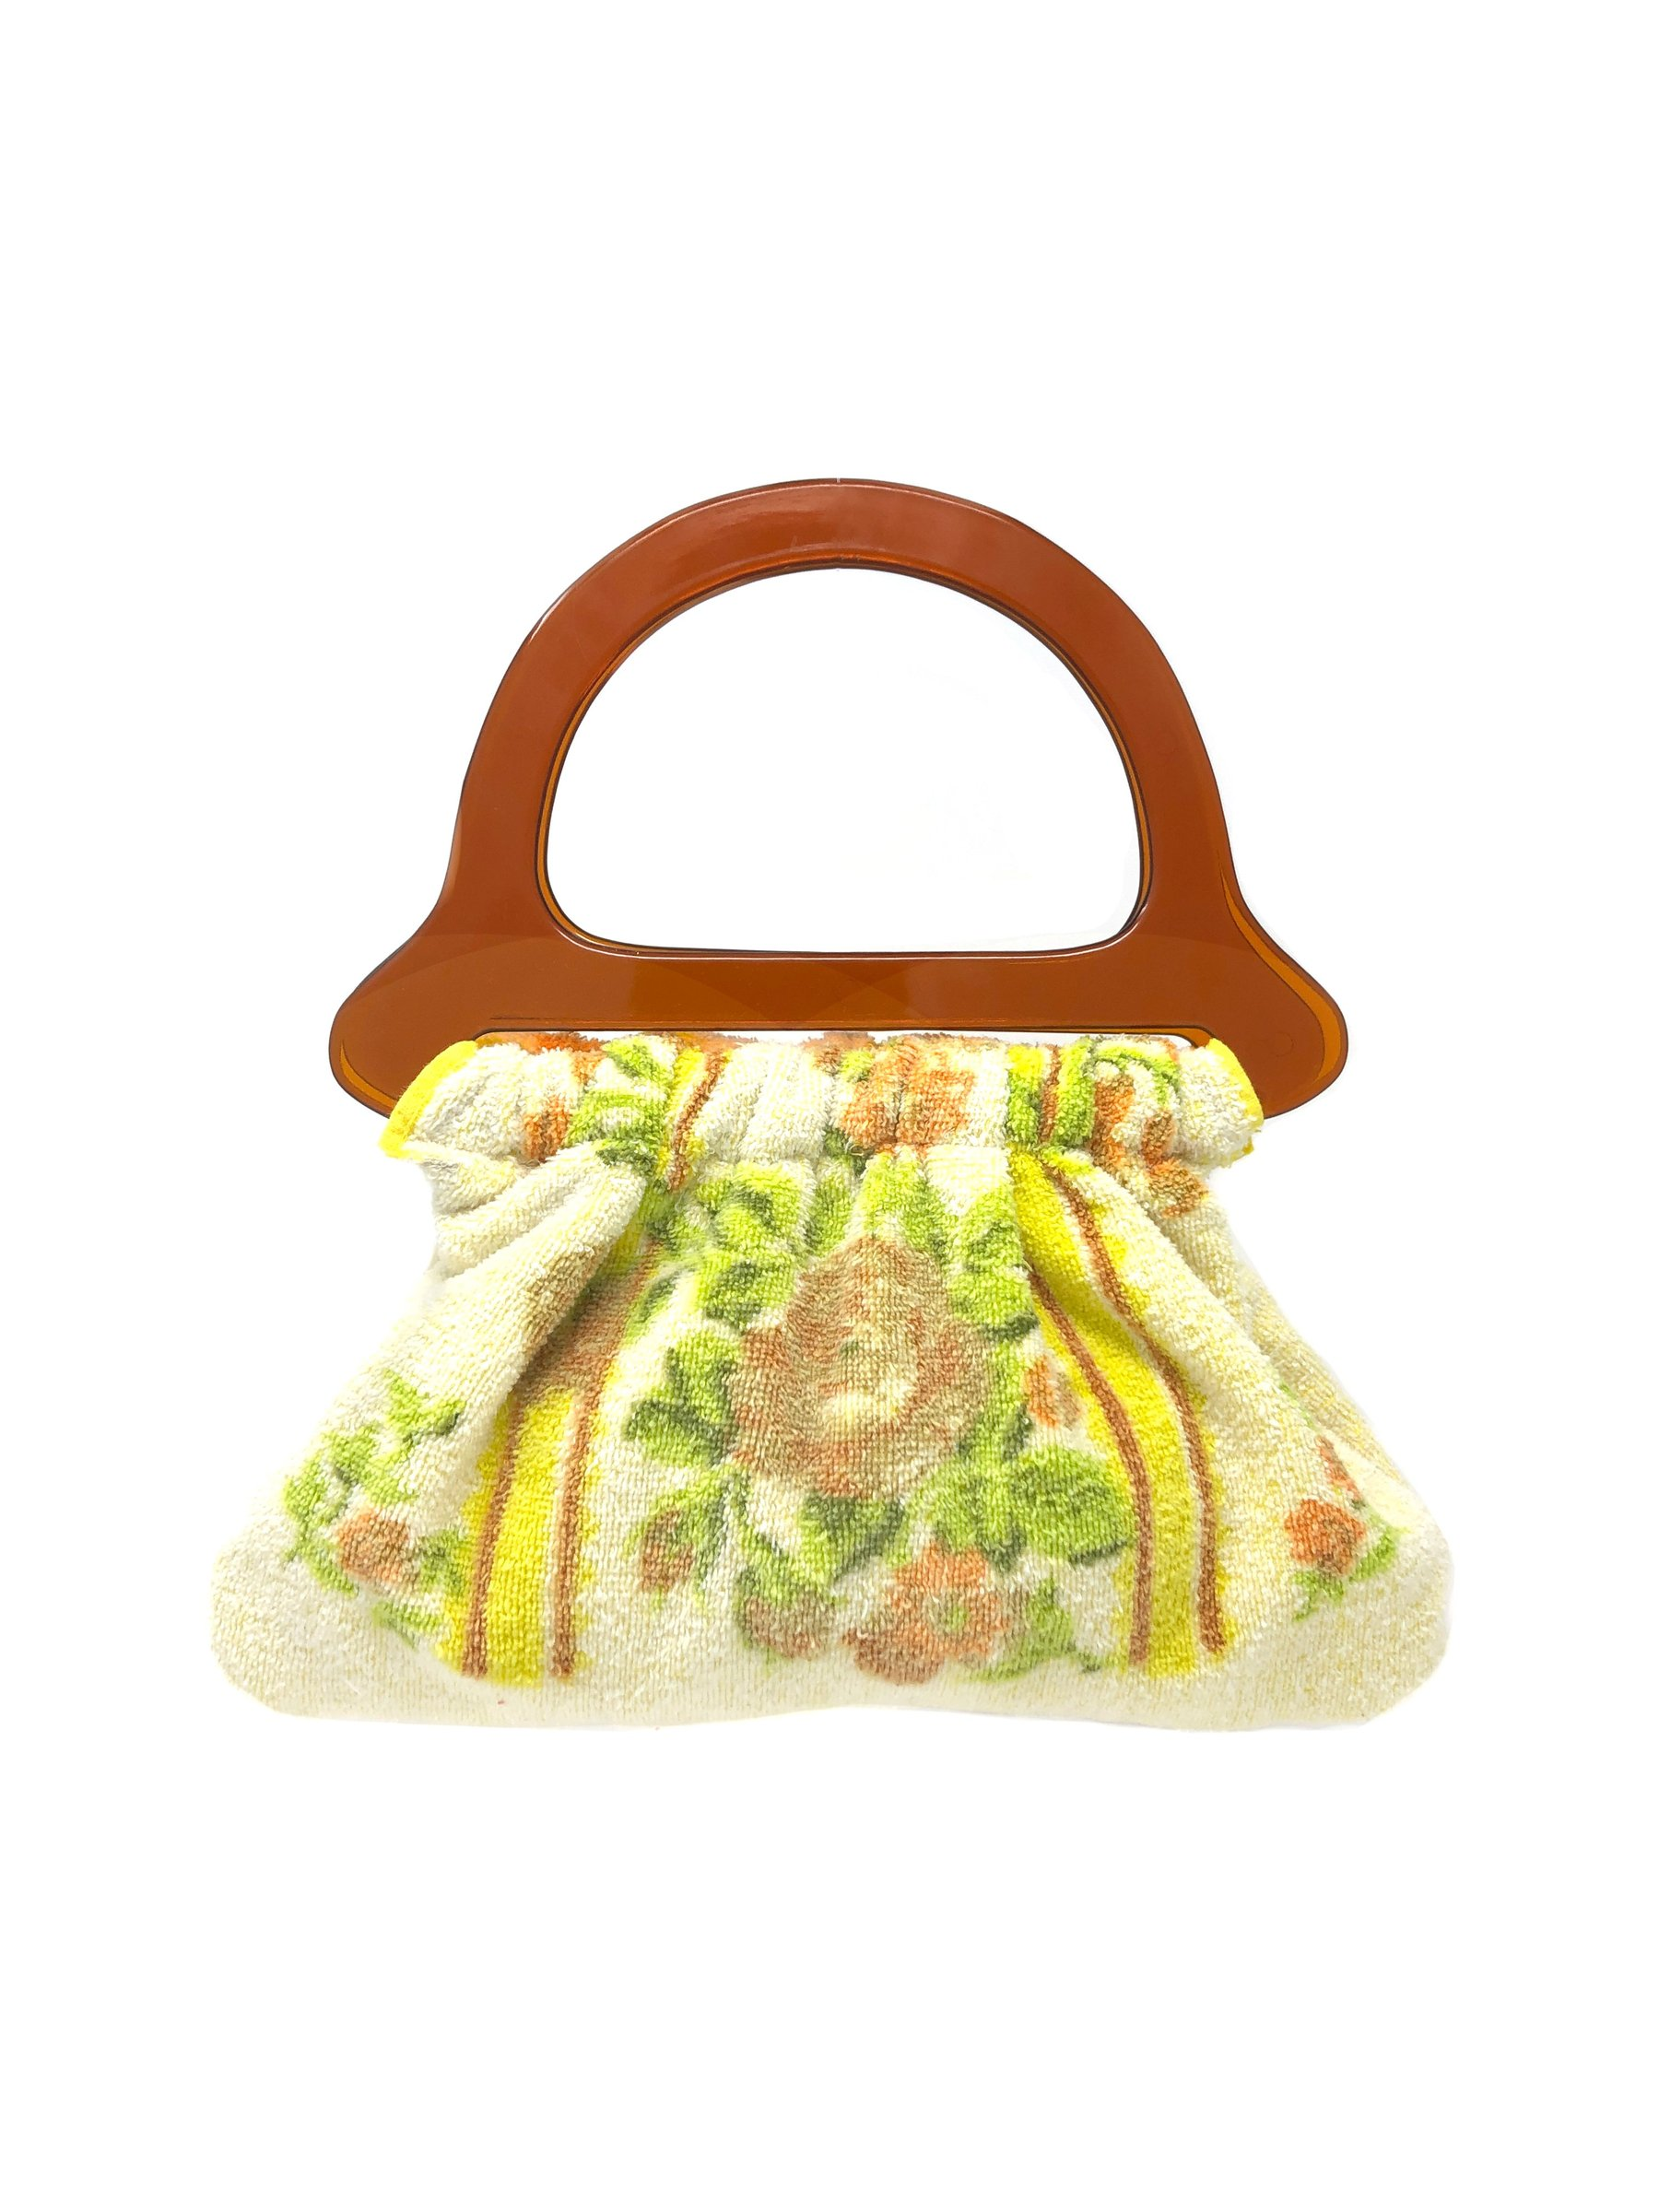 Floral print terry cloth handbag with deadstock acrylic handles by TIANNA HANDBAG, available on gr8daneworld.com Kendall Jenner Bags Exact Product